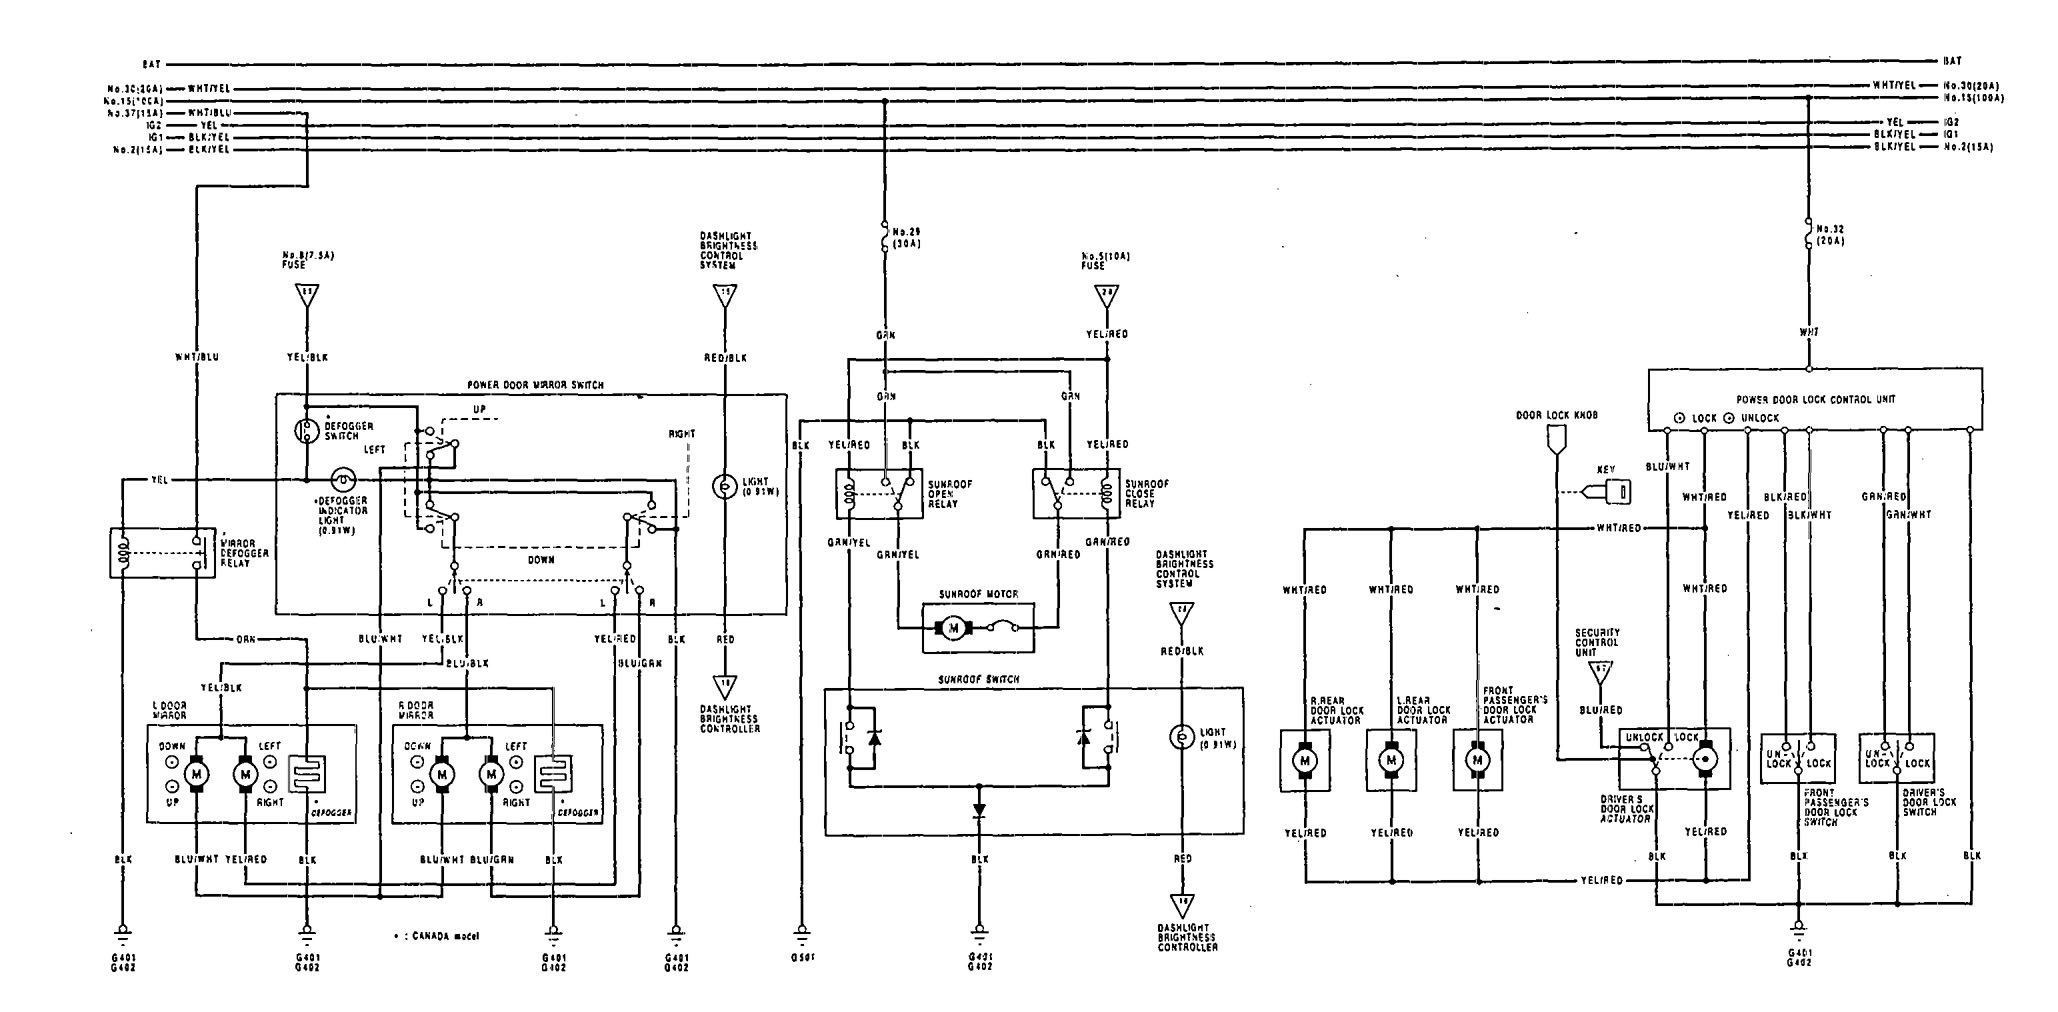 Acura Vigor Wiring Diagram : Acura vigor fuse box example electrical wiring diagram